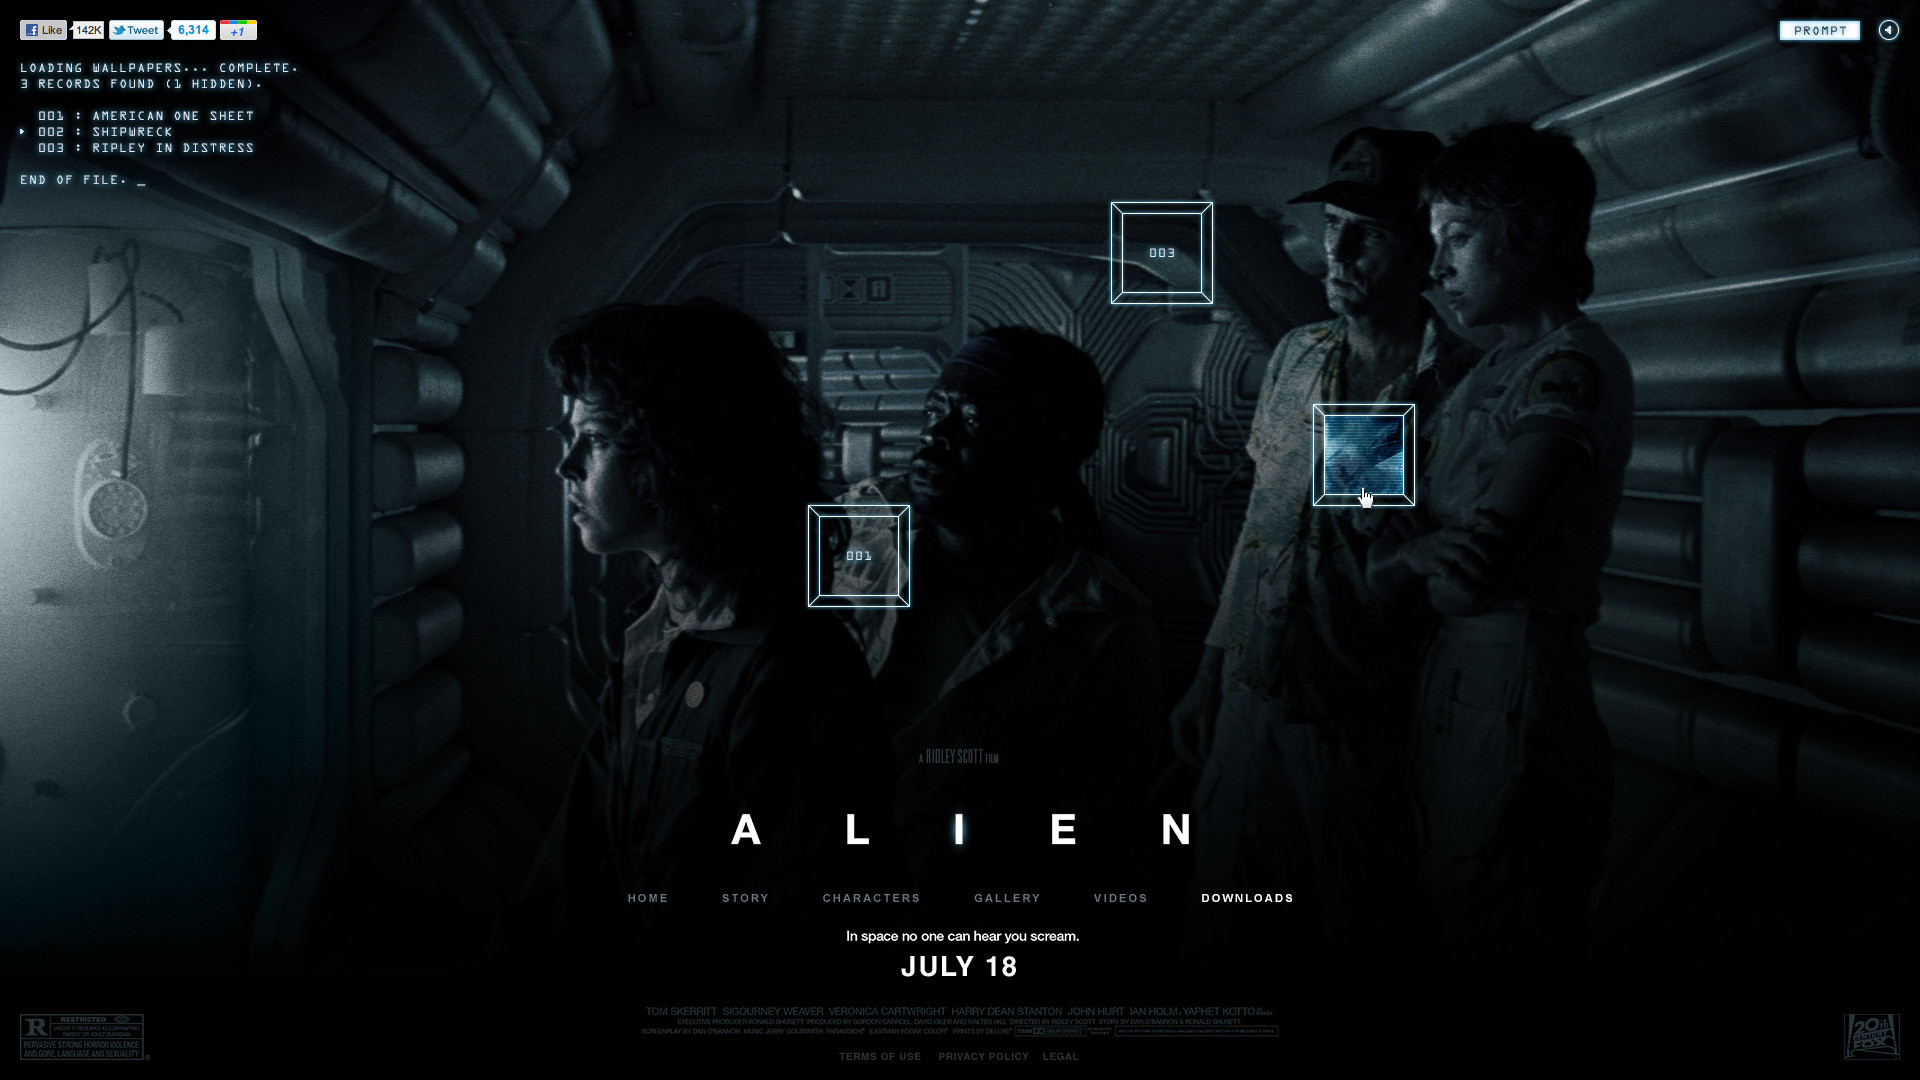 alien movie wallpaper 75 images